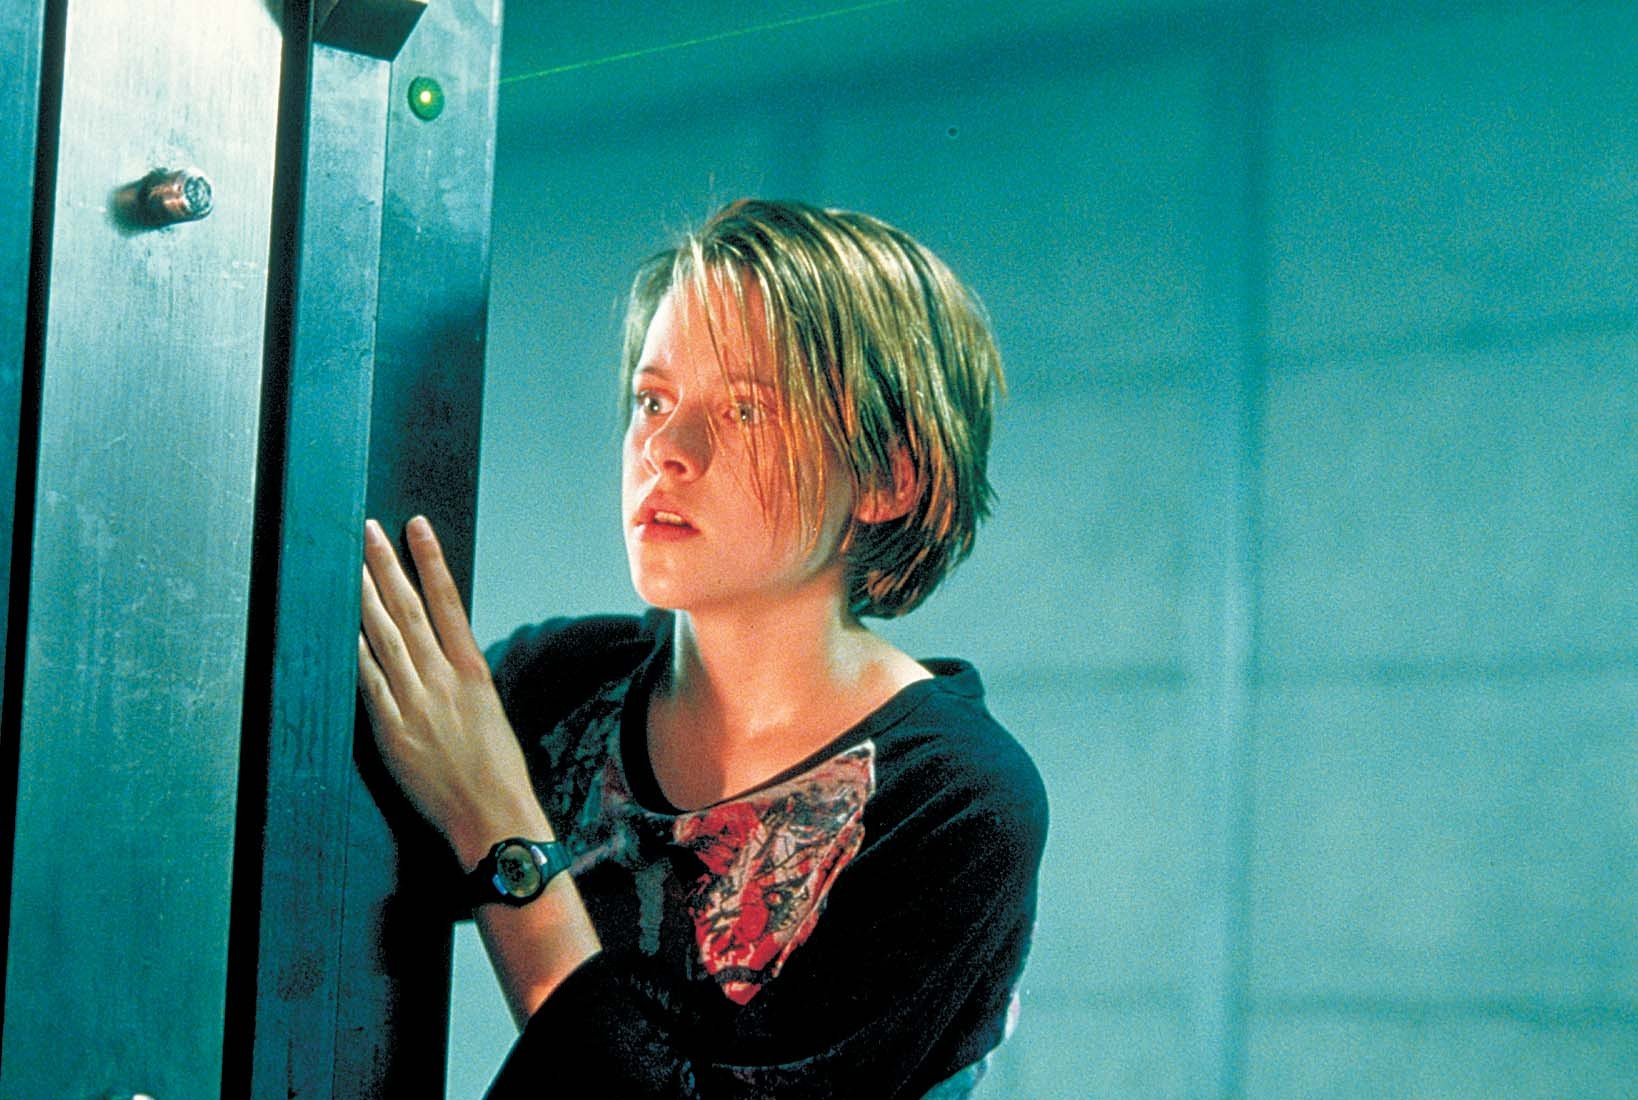 Kristen Stewart in Panic Room (2002)